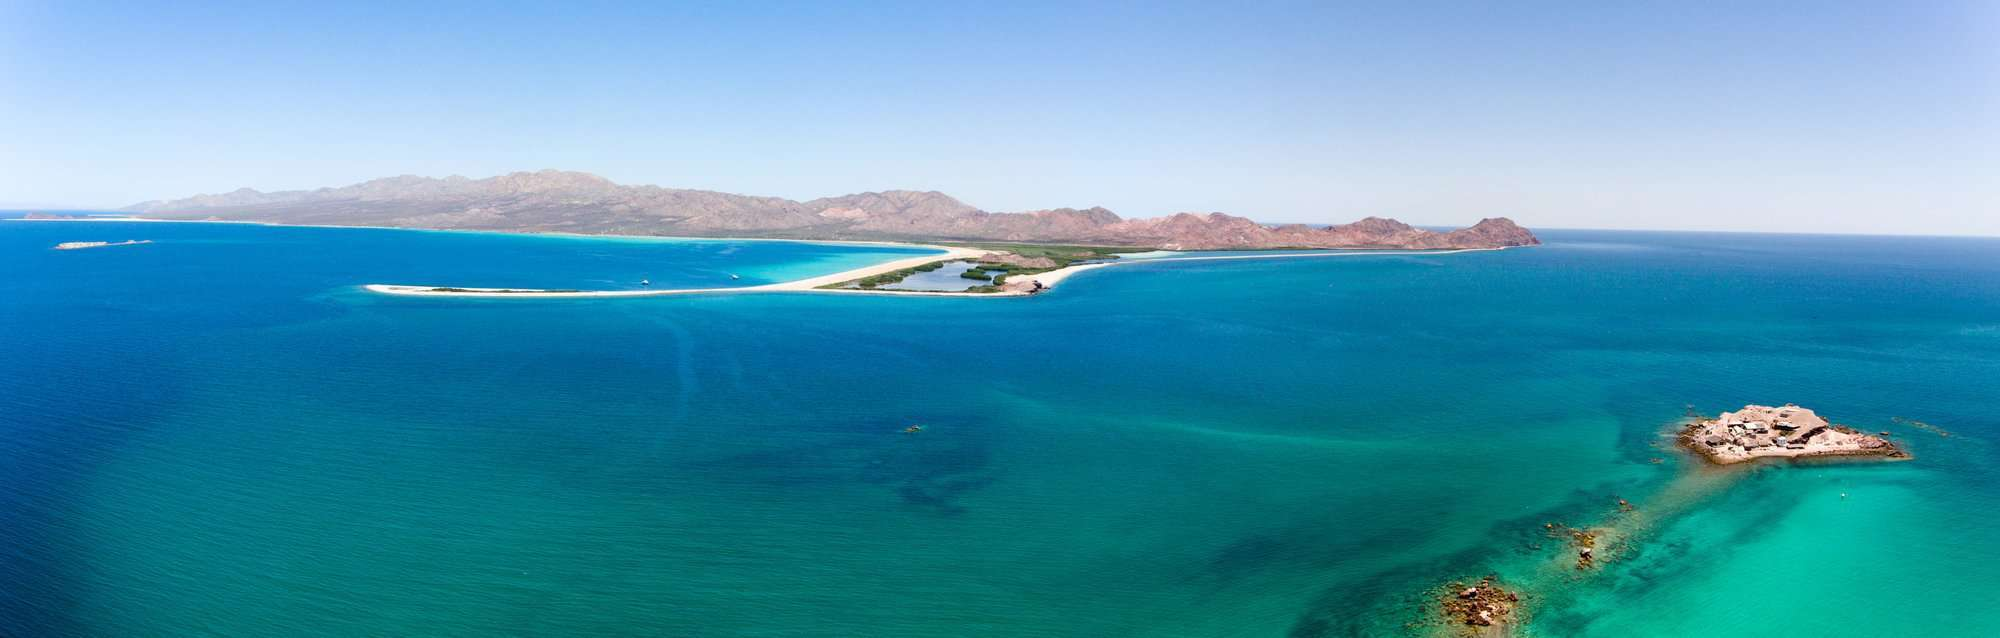 isla San Jose, Baja California Sur, Mexico. Sea of cortez.